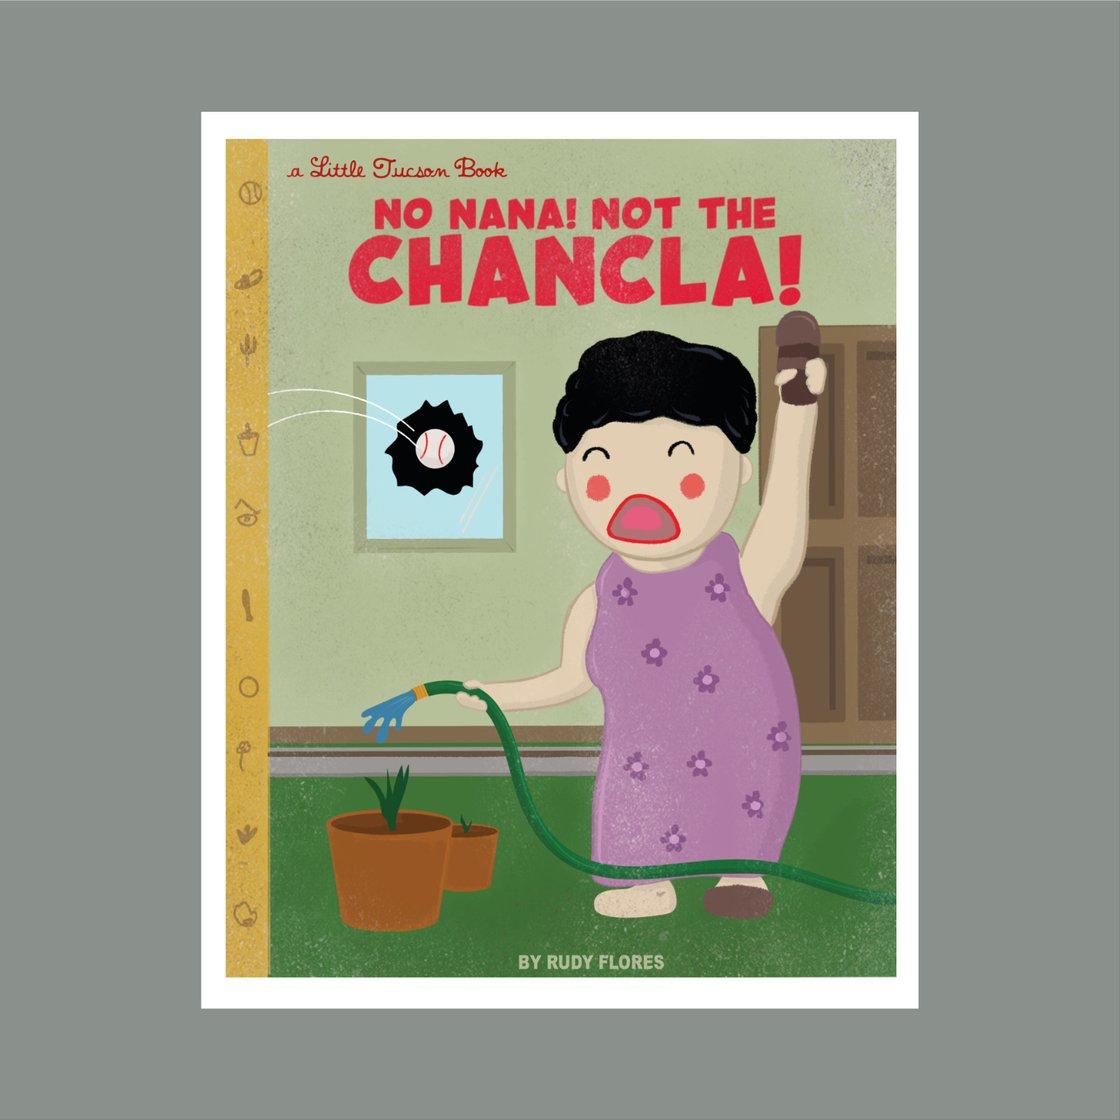 Image of No Nana! Not the Chancla